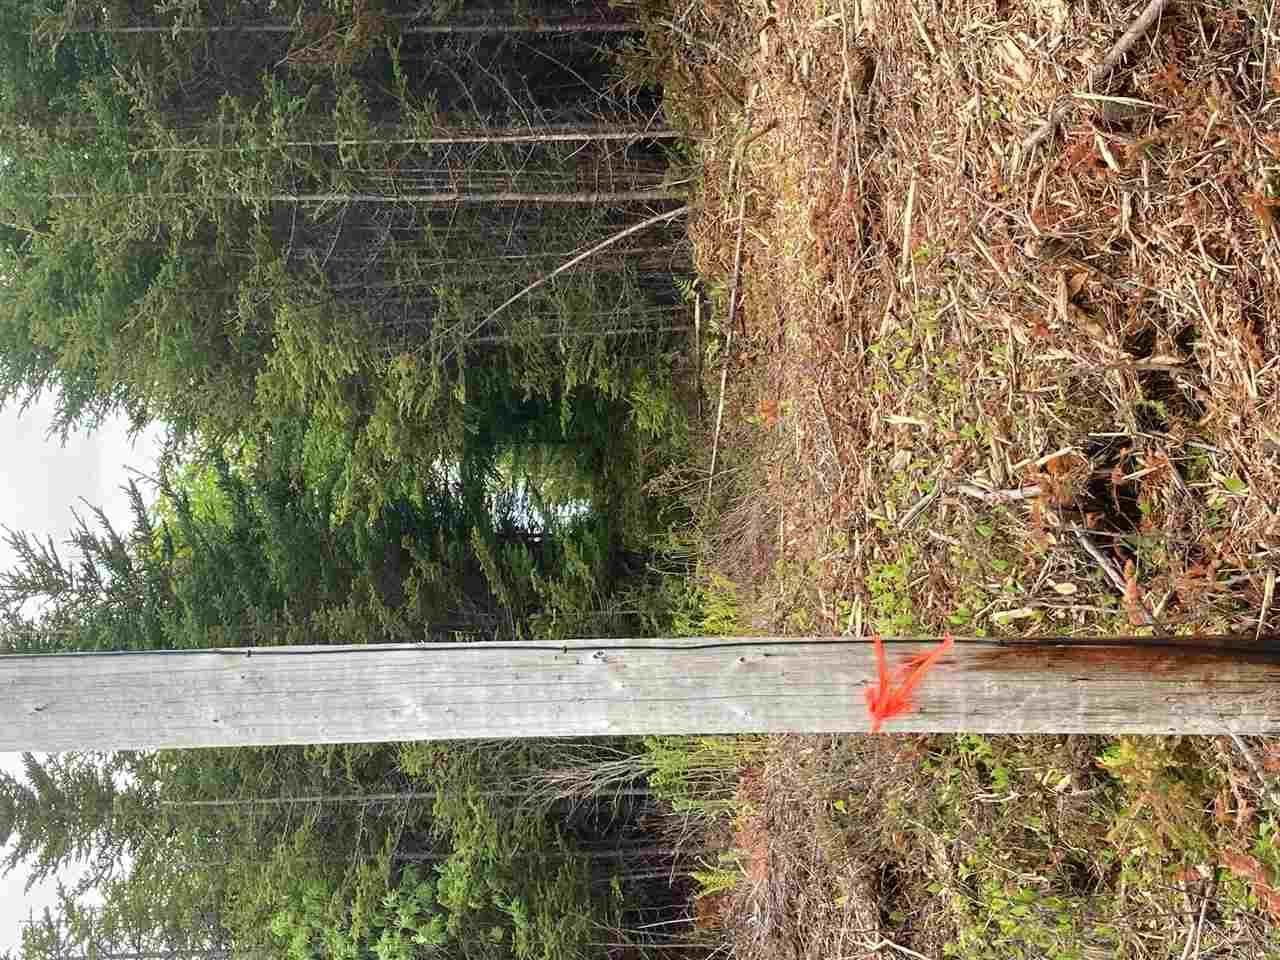 Photo 9: Photos: 1405 Highway 7 in Marie Joseph: 303-Guysborough County Vacant Land for sale (Highland Region)  : MLS®# 202010345